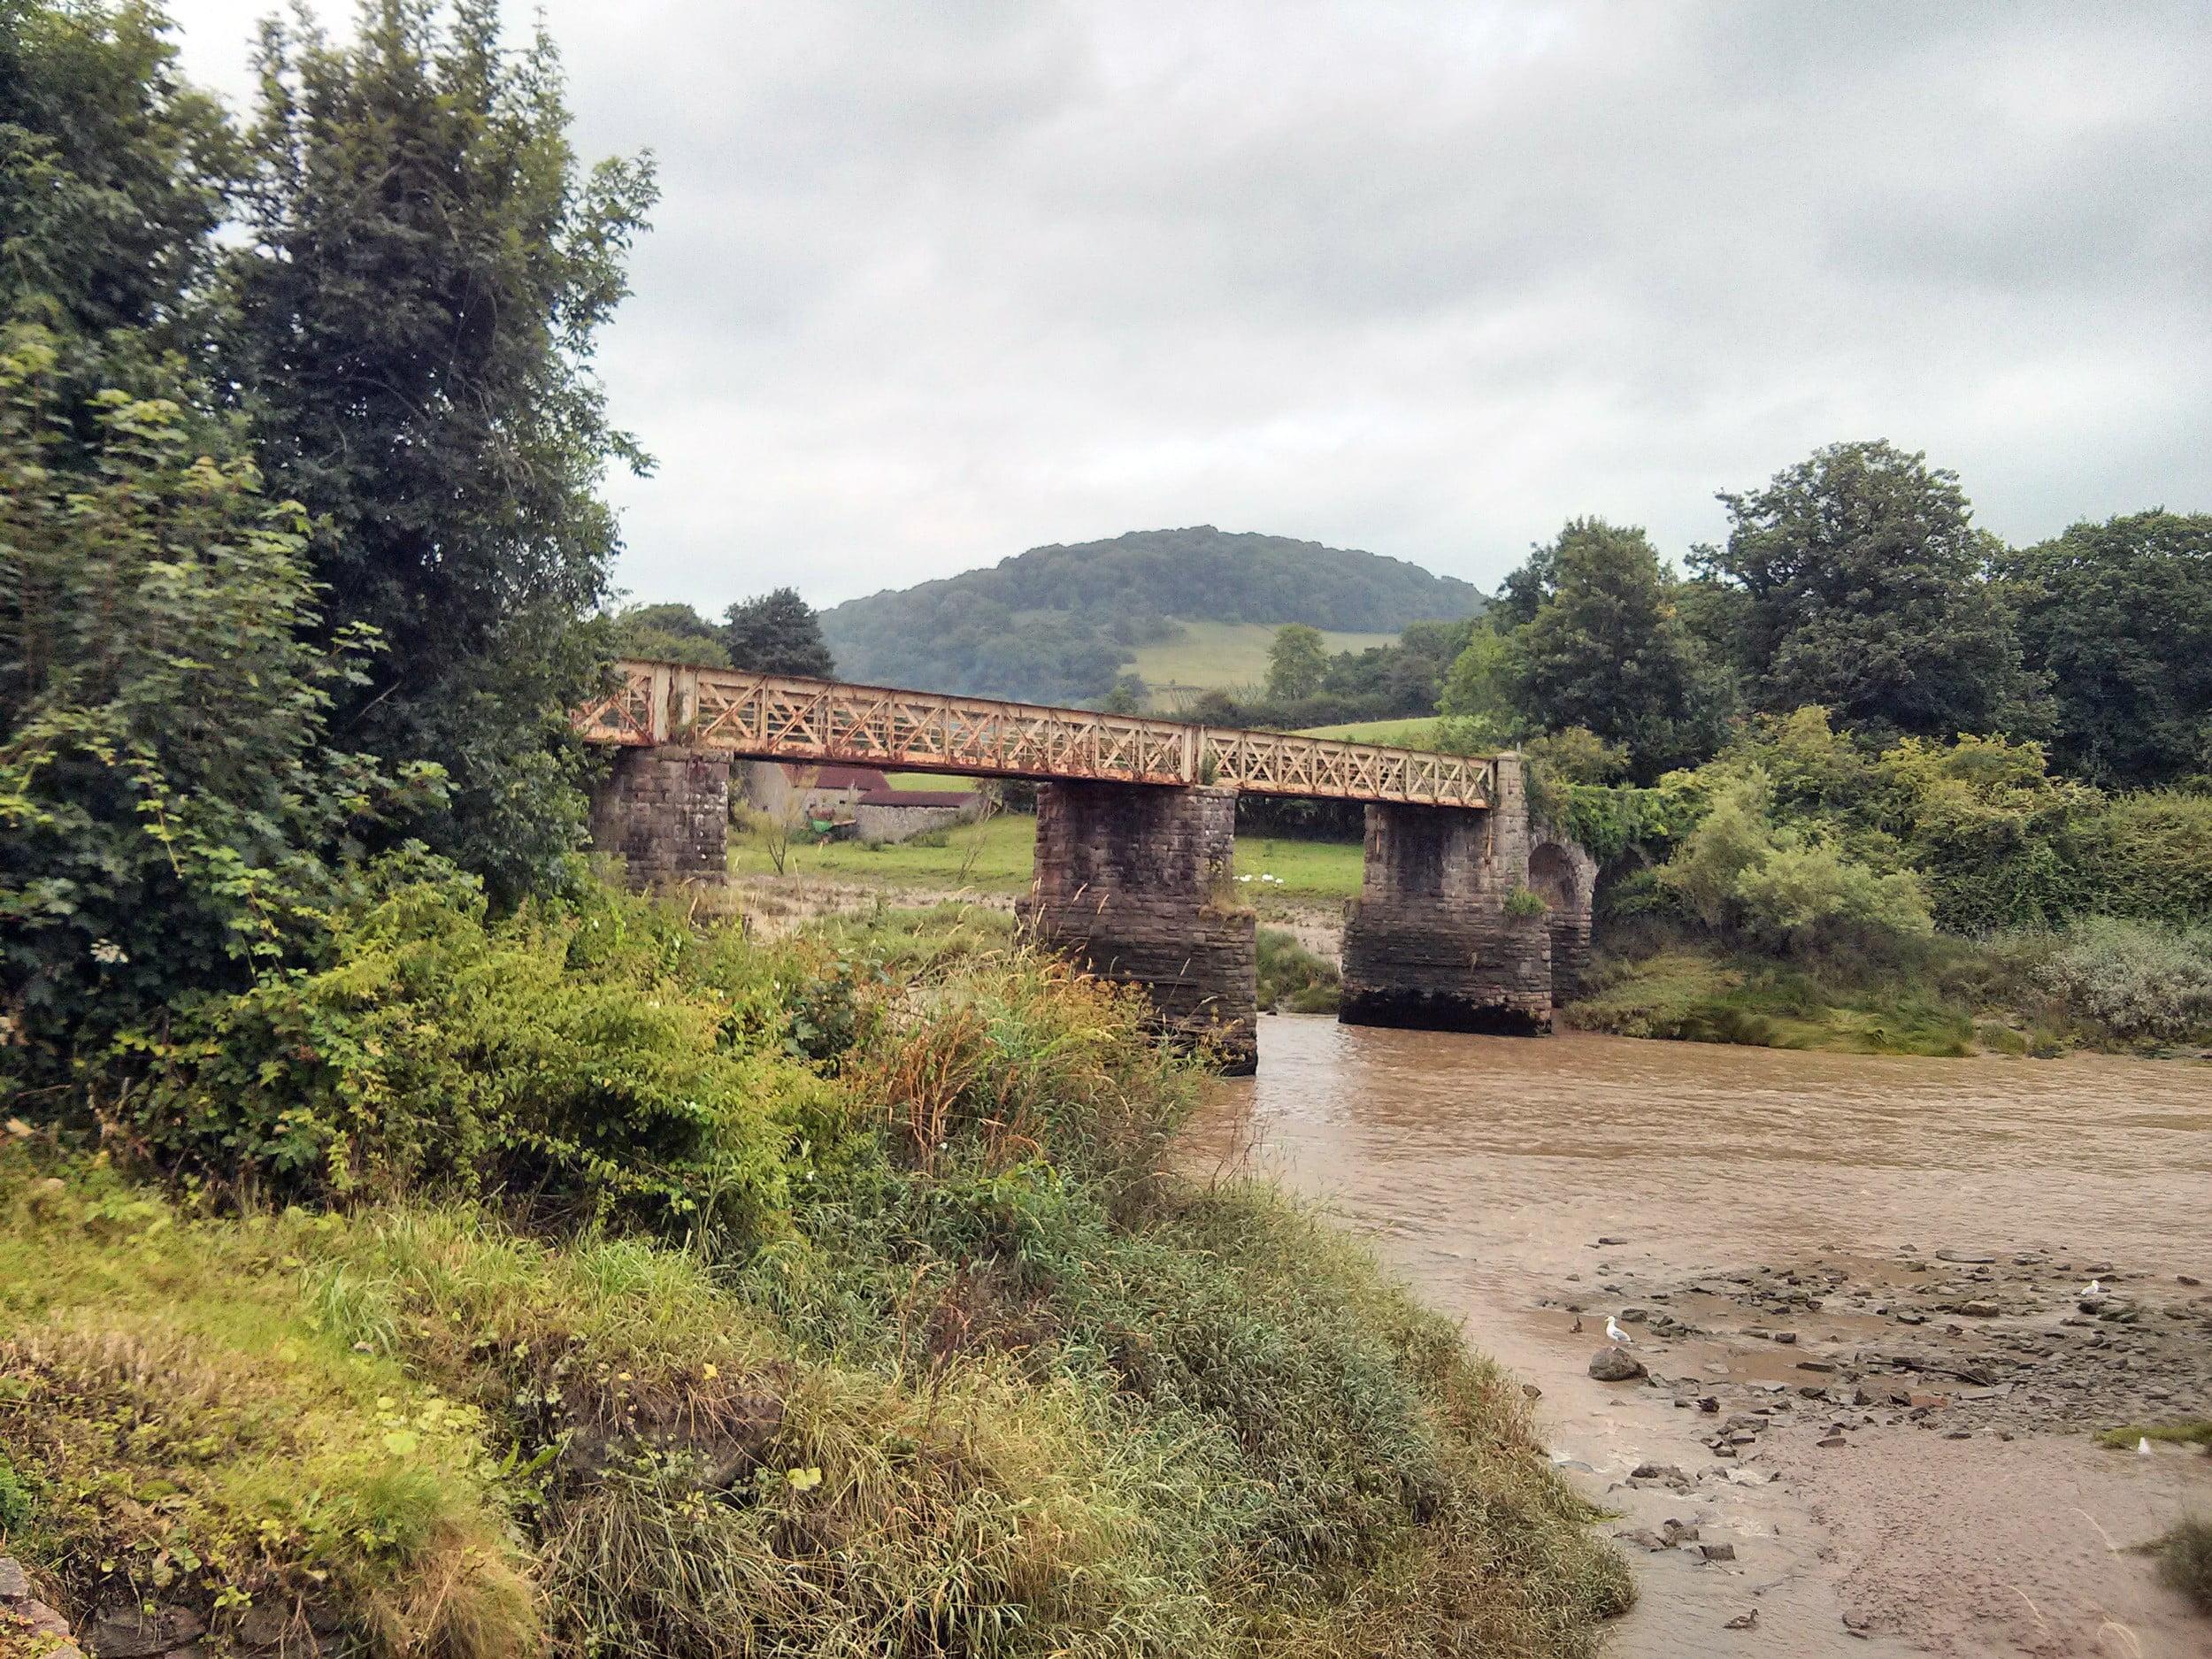 Wireworks Railways Bridge copyright Maryann Soper